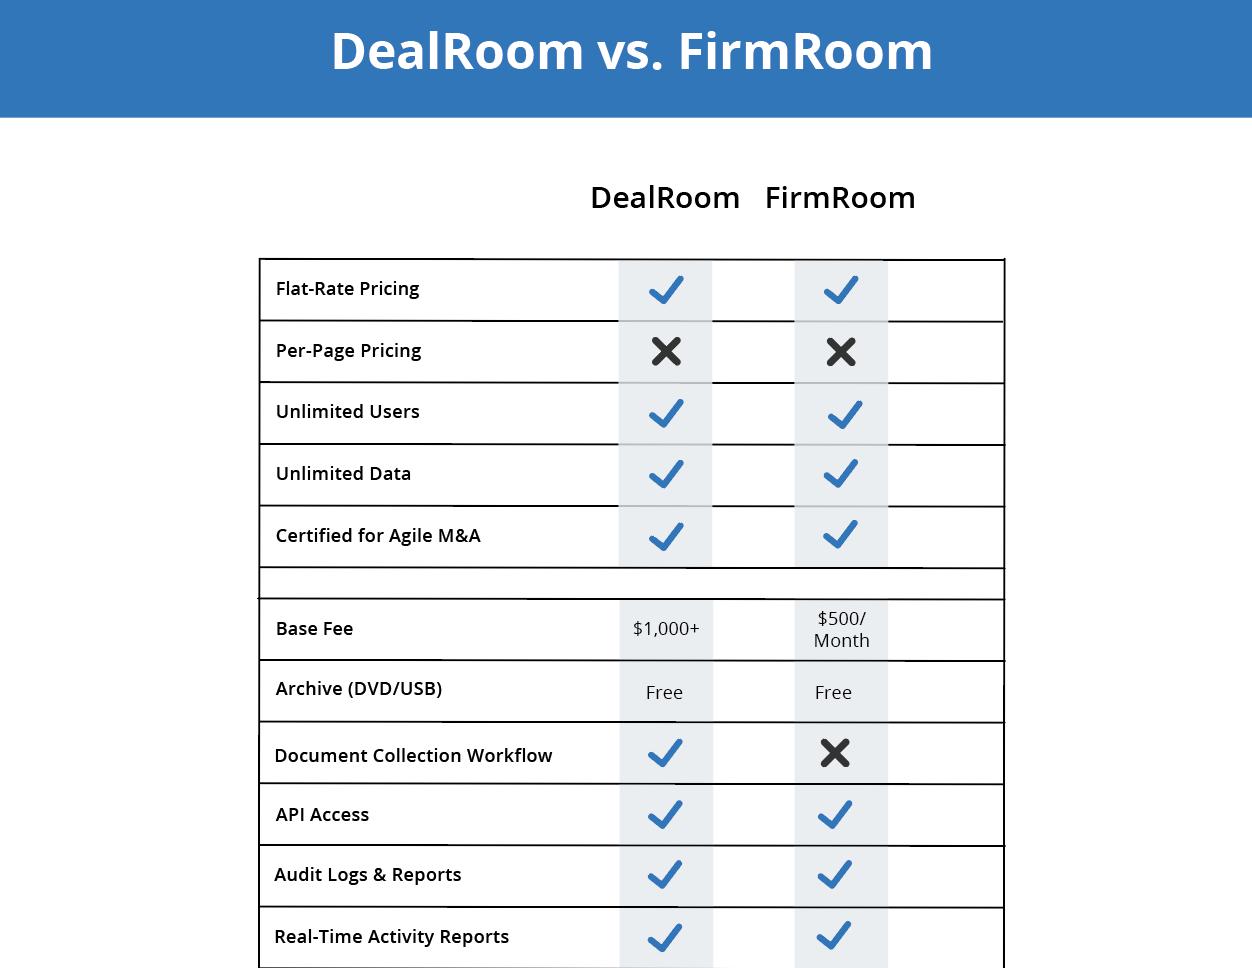 dealroom vs firmroom for M&A